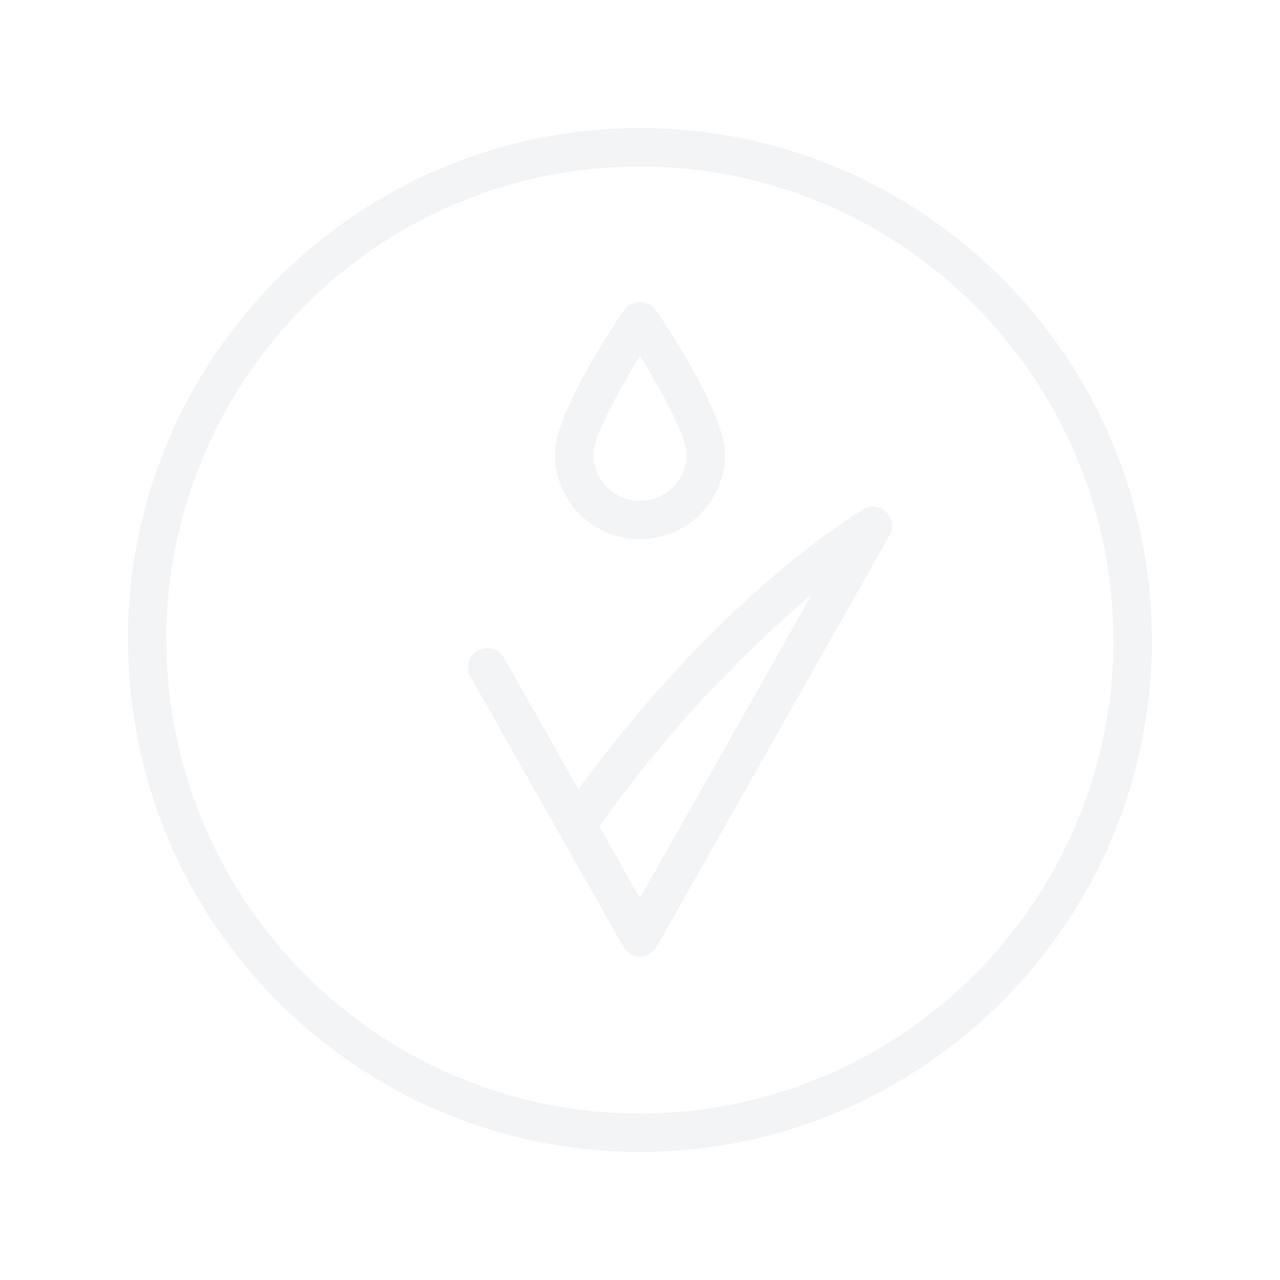 GOSH Colour Corrector Kit набор цветных корректоров No.001 Colour Mix 5g